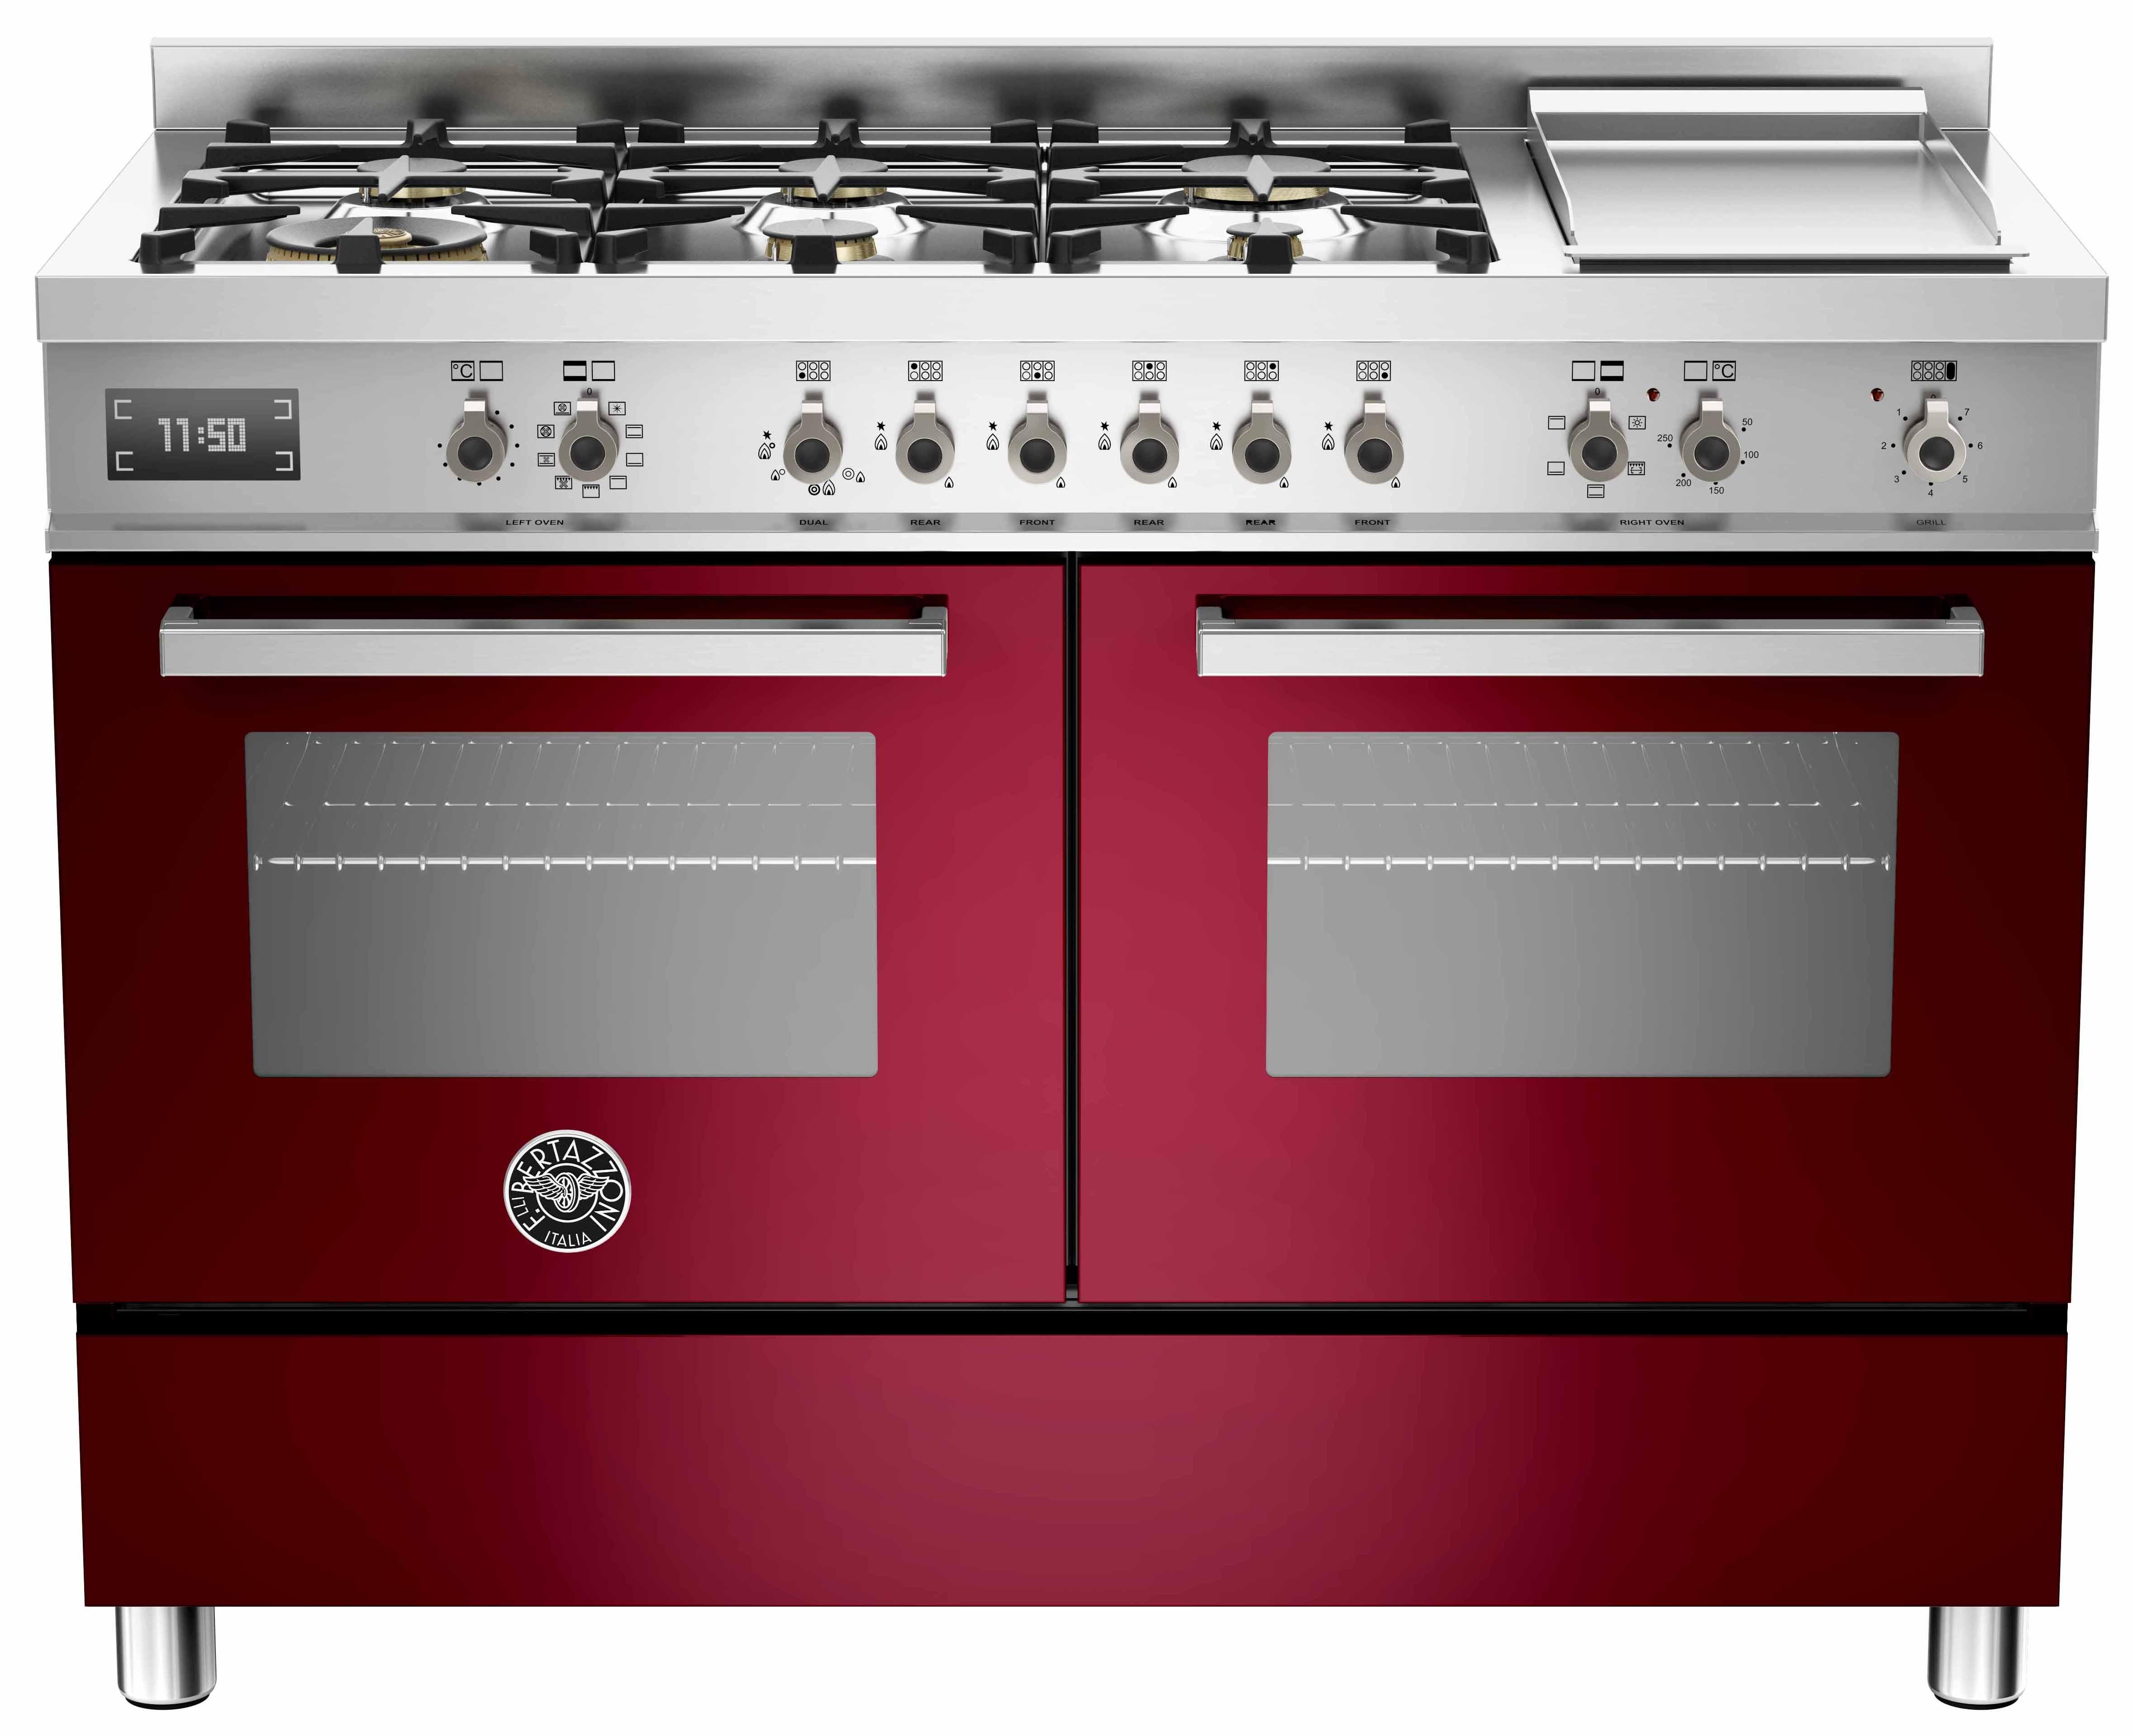 Bertazzoni PRO1206 Gasspis 120 cm, 2 ugnar, 6 brännare + elektrisk tepanyaki, vinröd